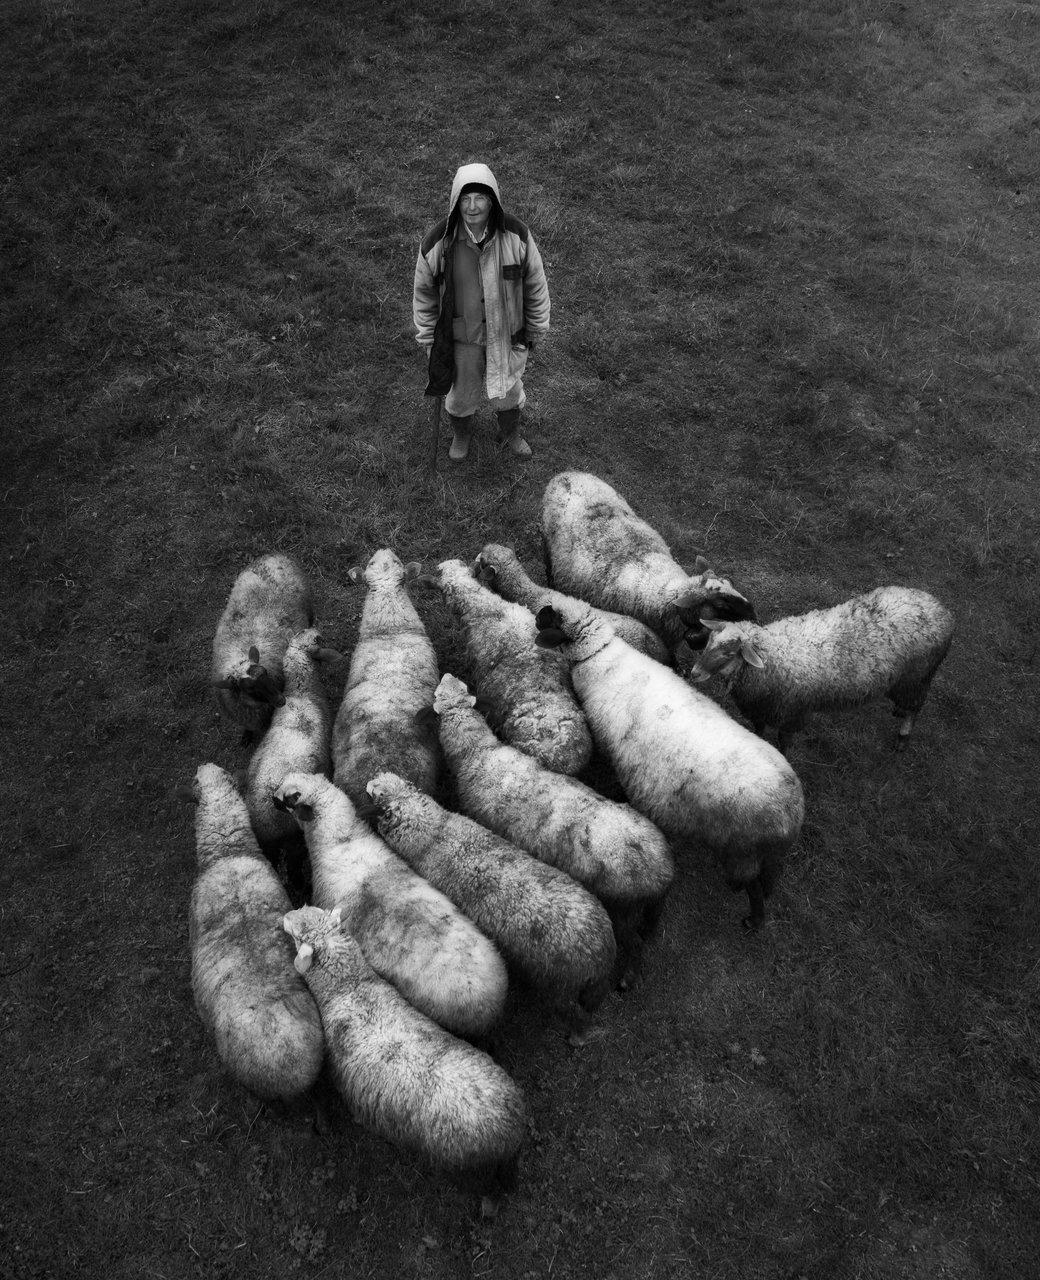 Photo in Reportage | Author Radoslav Sviretsov - rgsphot | PHOTO FORUM